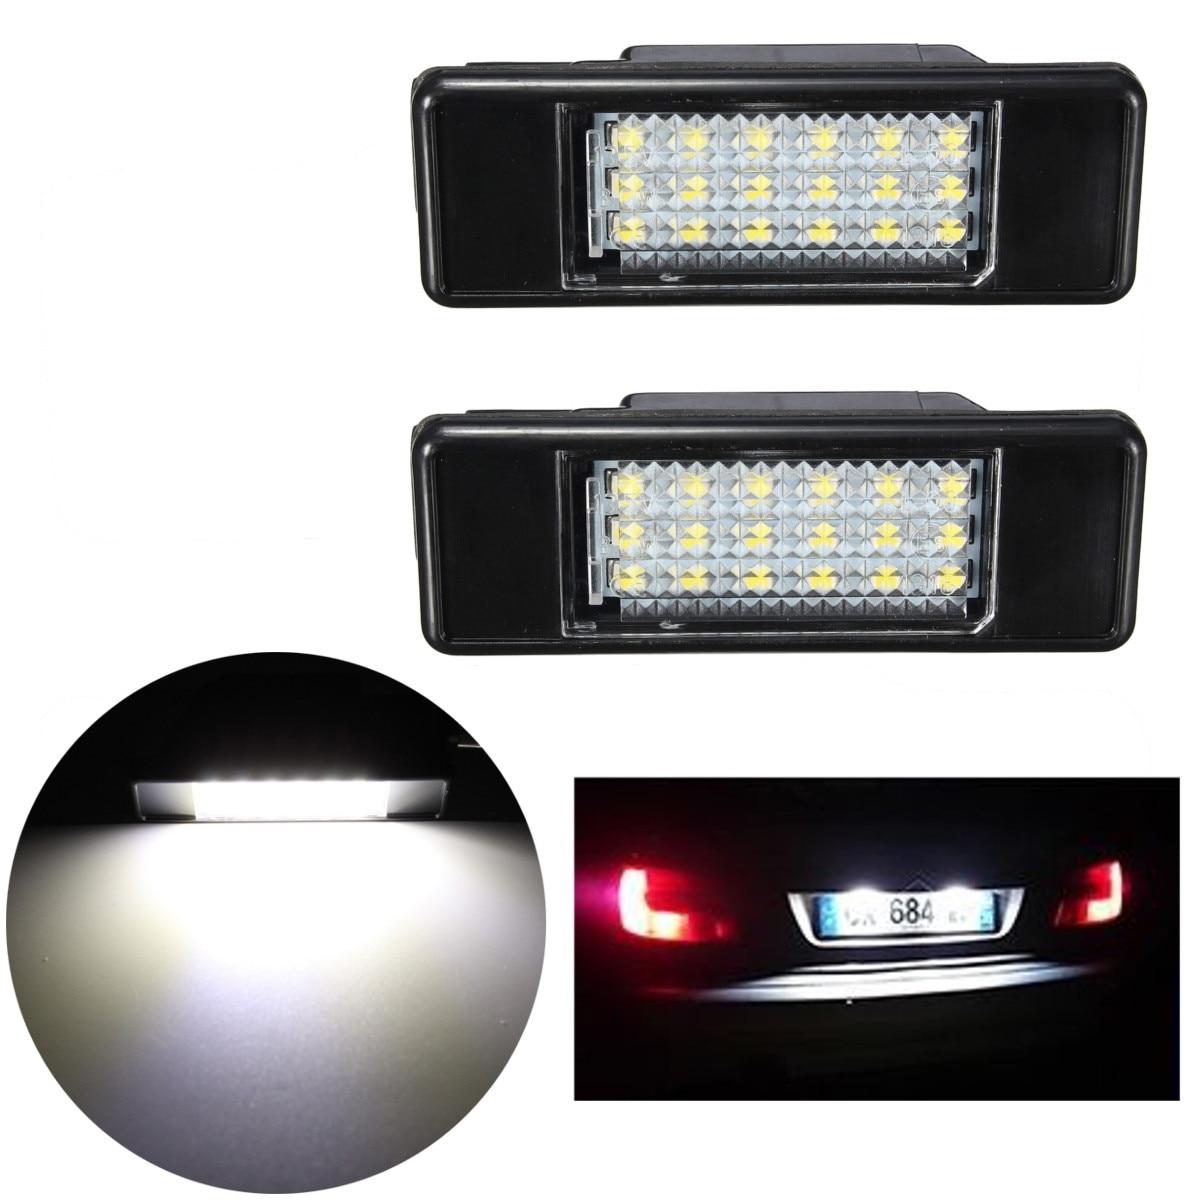 2 x coche trasero 18 LED SMD luz de placa de matrícula de la lámpara 6000K para Peugeot 106, 207, 307, 308, 406, 407, 508 para CITROEN C3 C4 C5 C6 C8